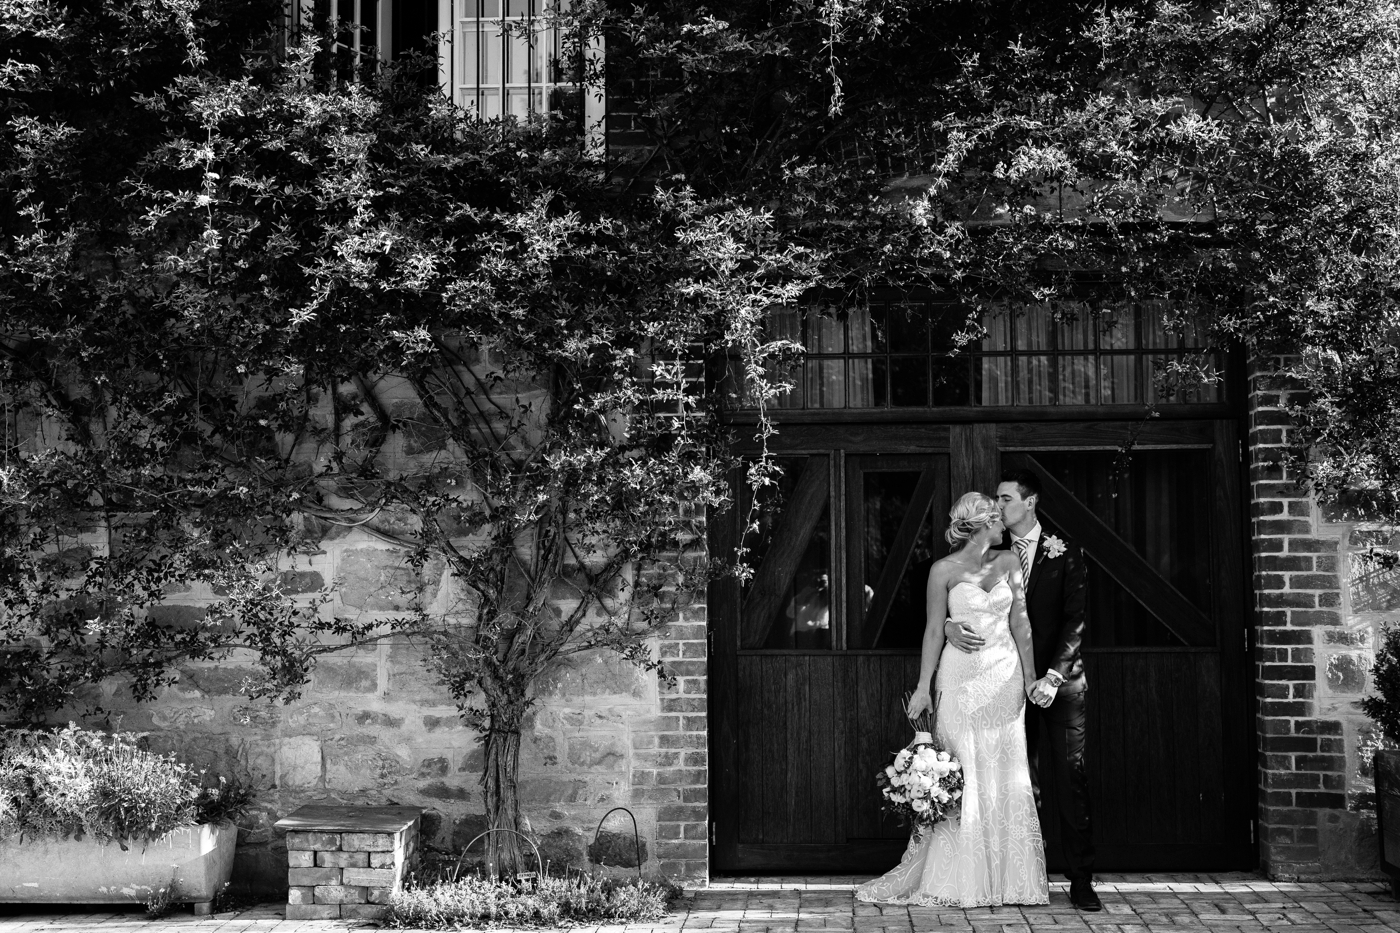 Lauren & Max - Marybank Estate Wedding - Natural wedding photographer in Adelaide - www.katherineschultzphotography.com 80